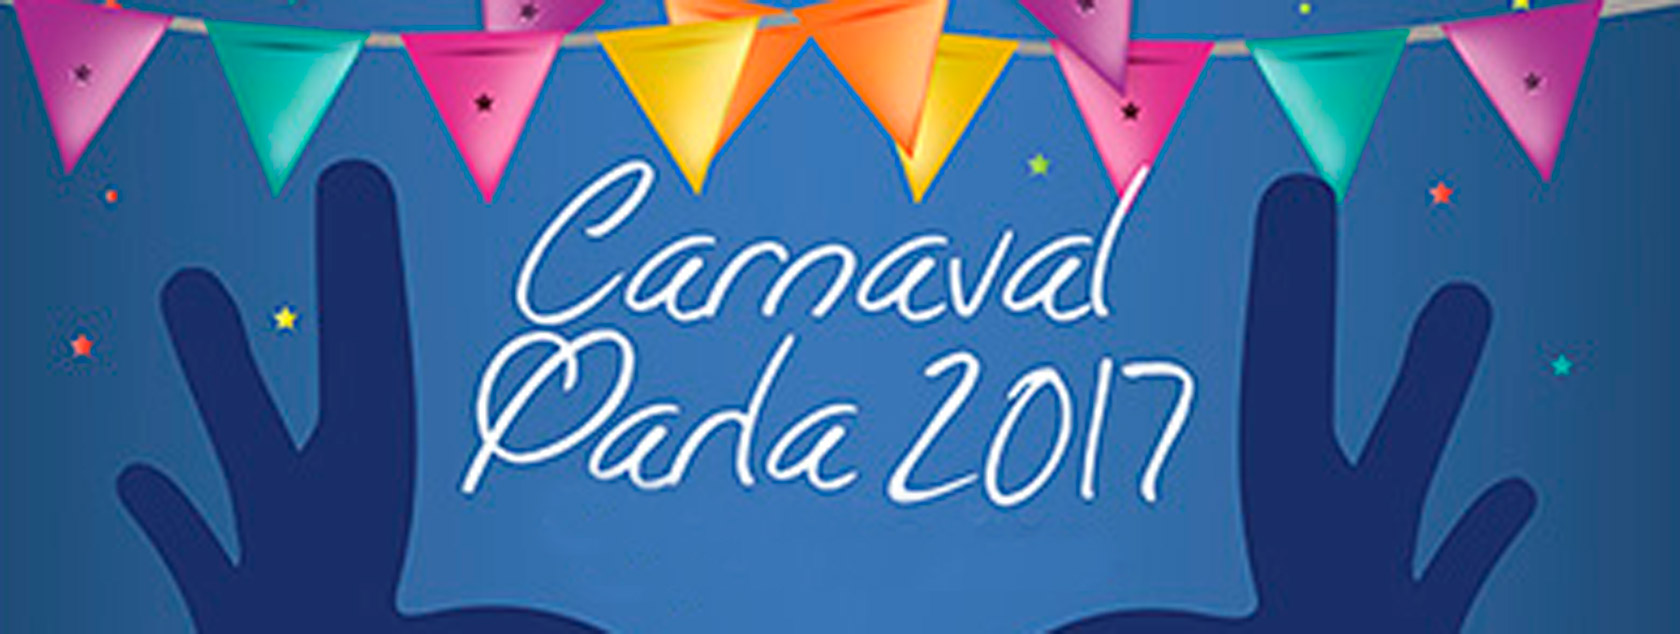 Carnaval 2017 en Parla